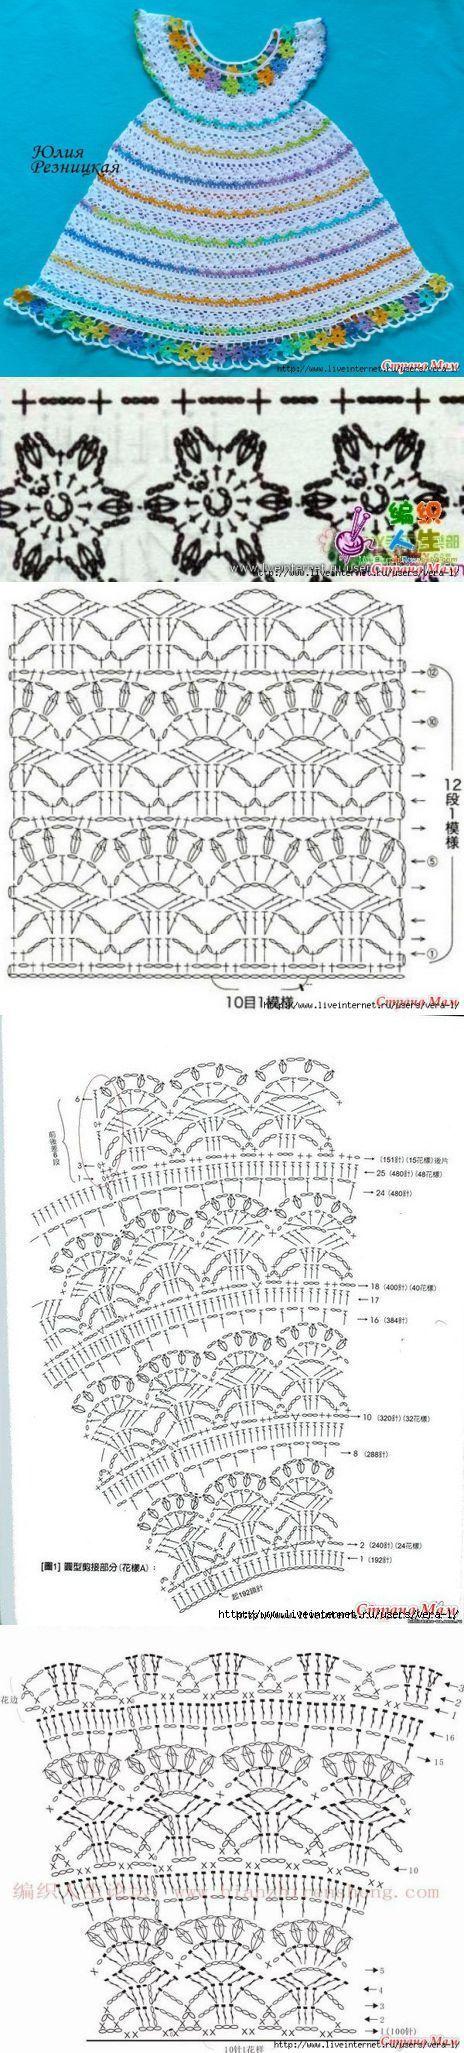 vestido nina crochet-patron-grafico-esquema-otakulandia.es (13)